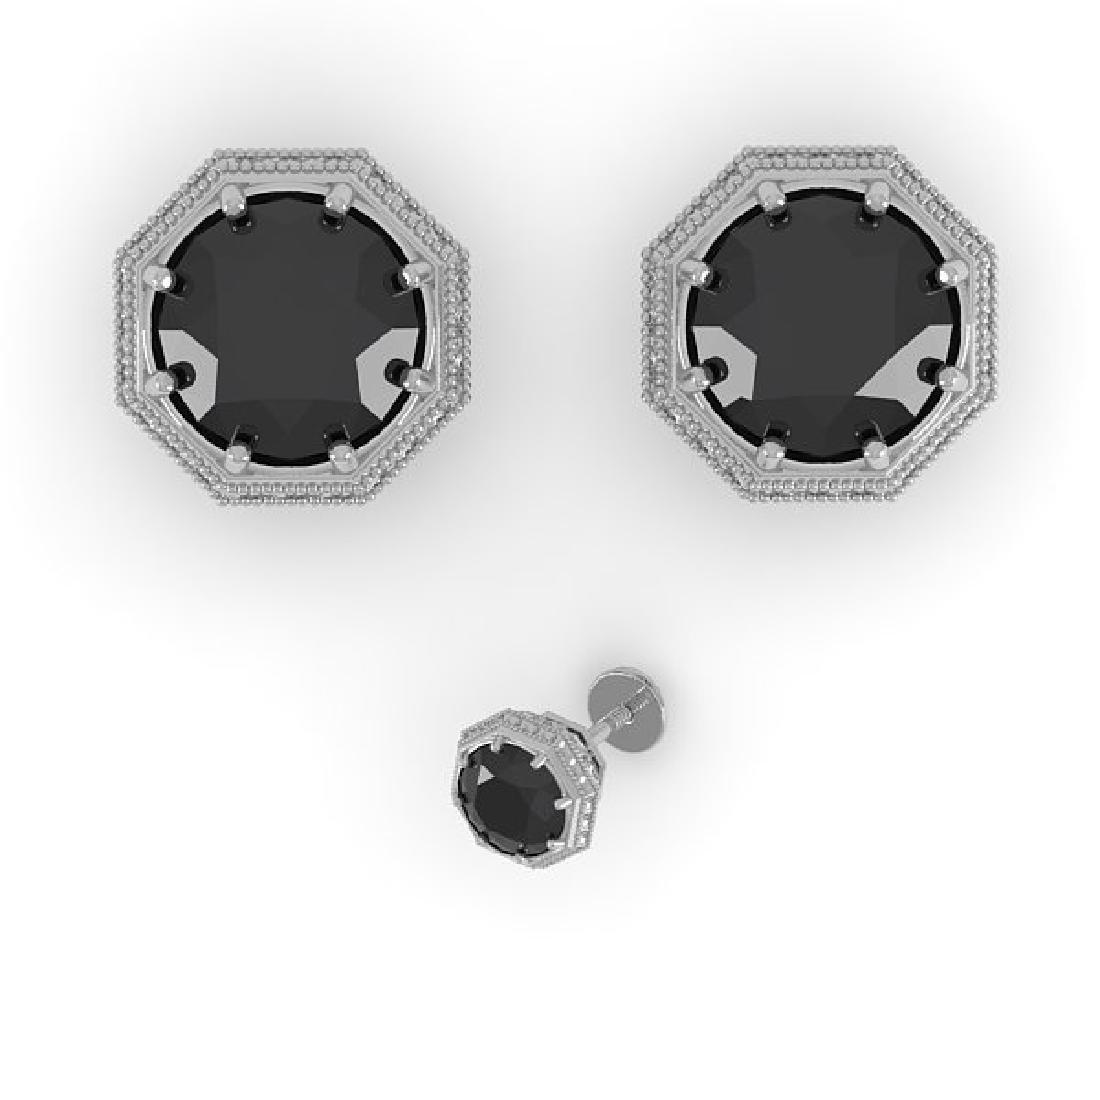 1.0 CTW Black Diamond Stud Solitaire Earrings 14K White - 2